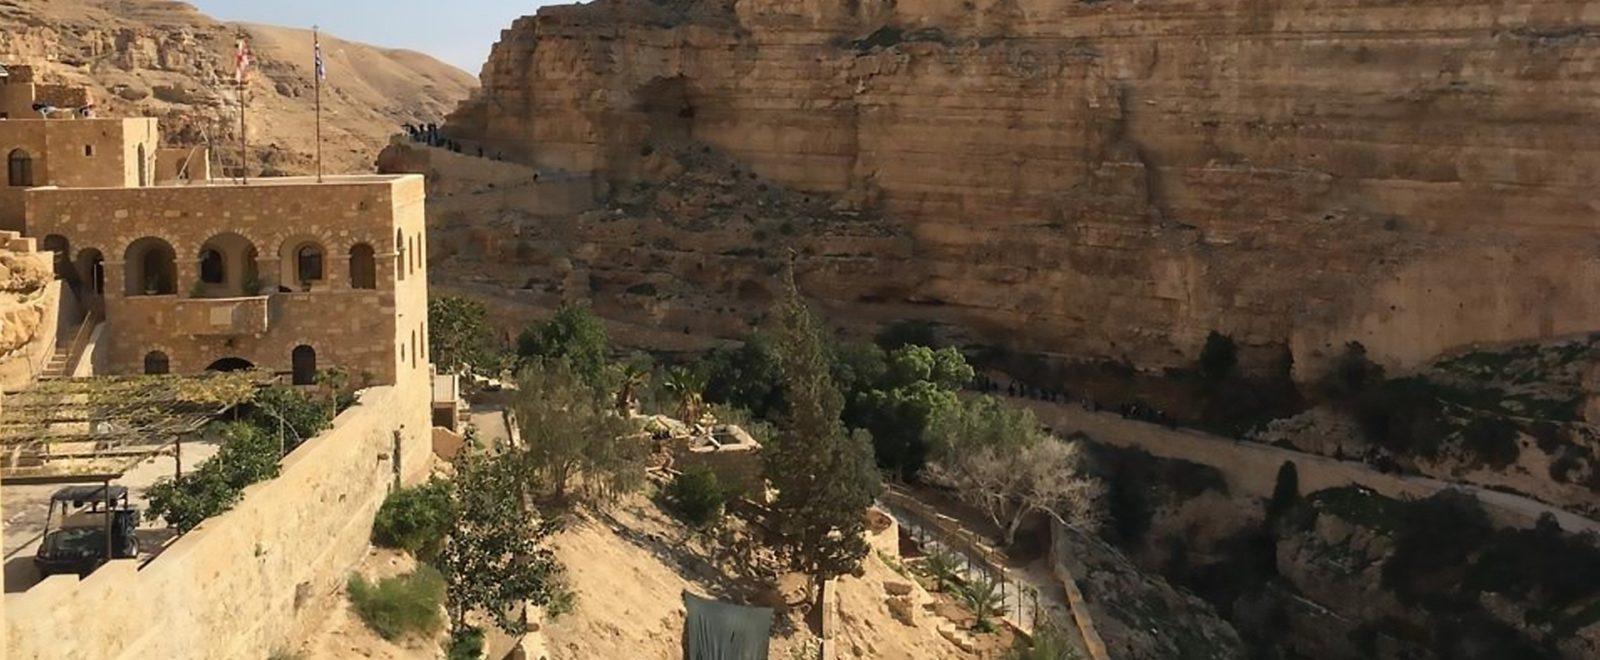 Monastery of Saint George | Jericho churches and Monasteries